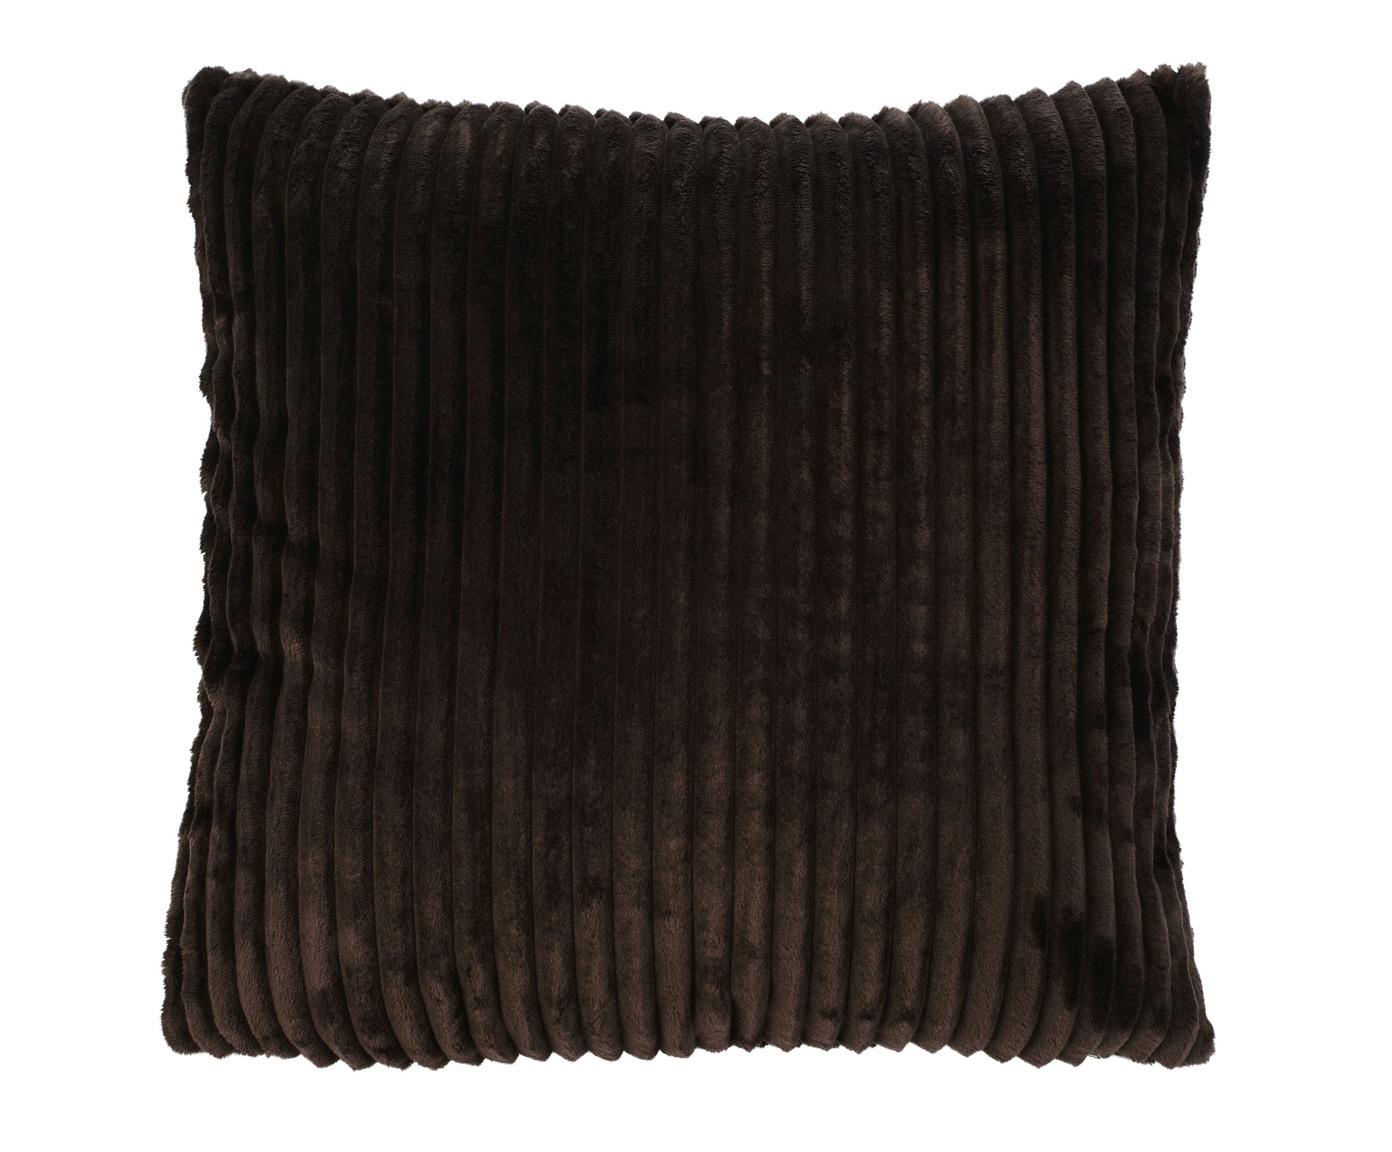 Kissen (gefüllt) Cord Optik 50x50 dunkelbraun